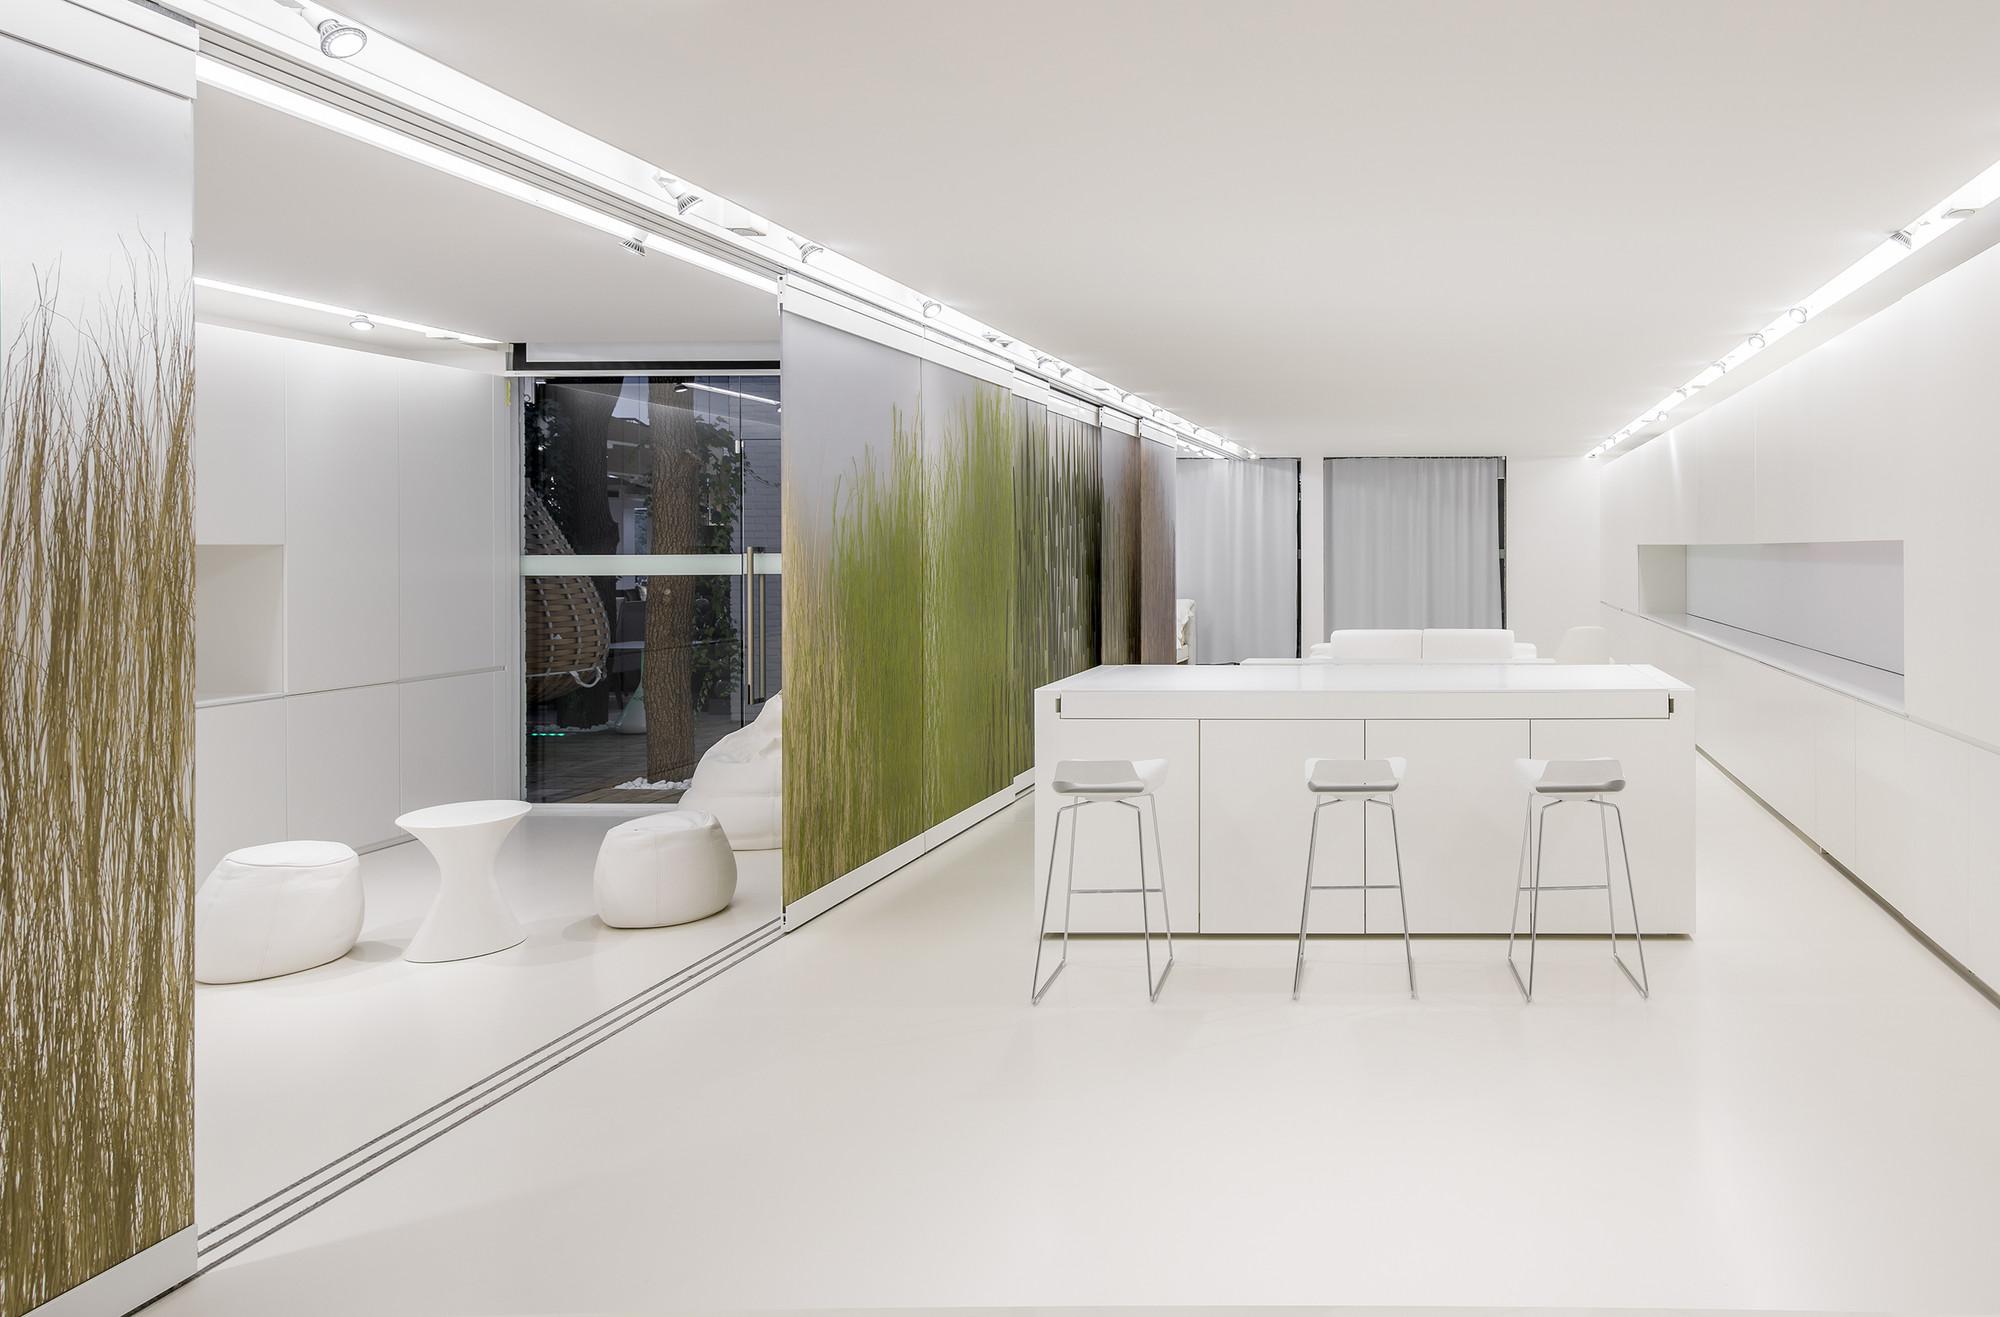 The Apartment of the Future - R&D Laboratory / NArchitekTURA, © Jakub Certowicz